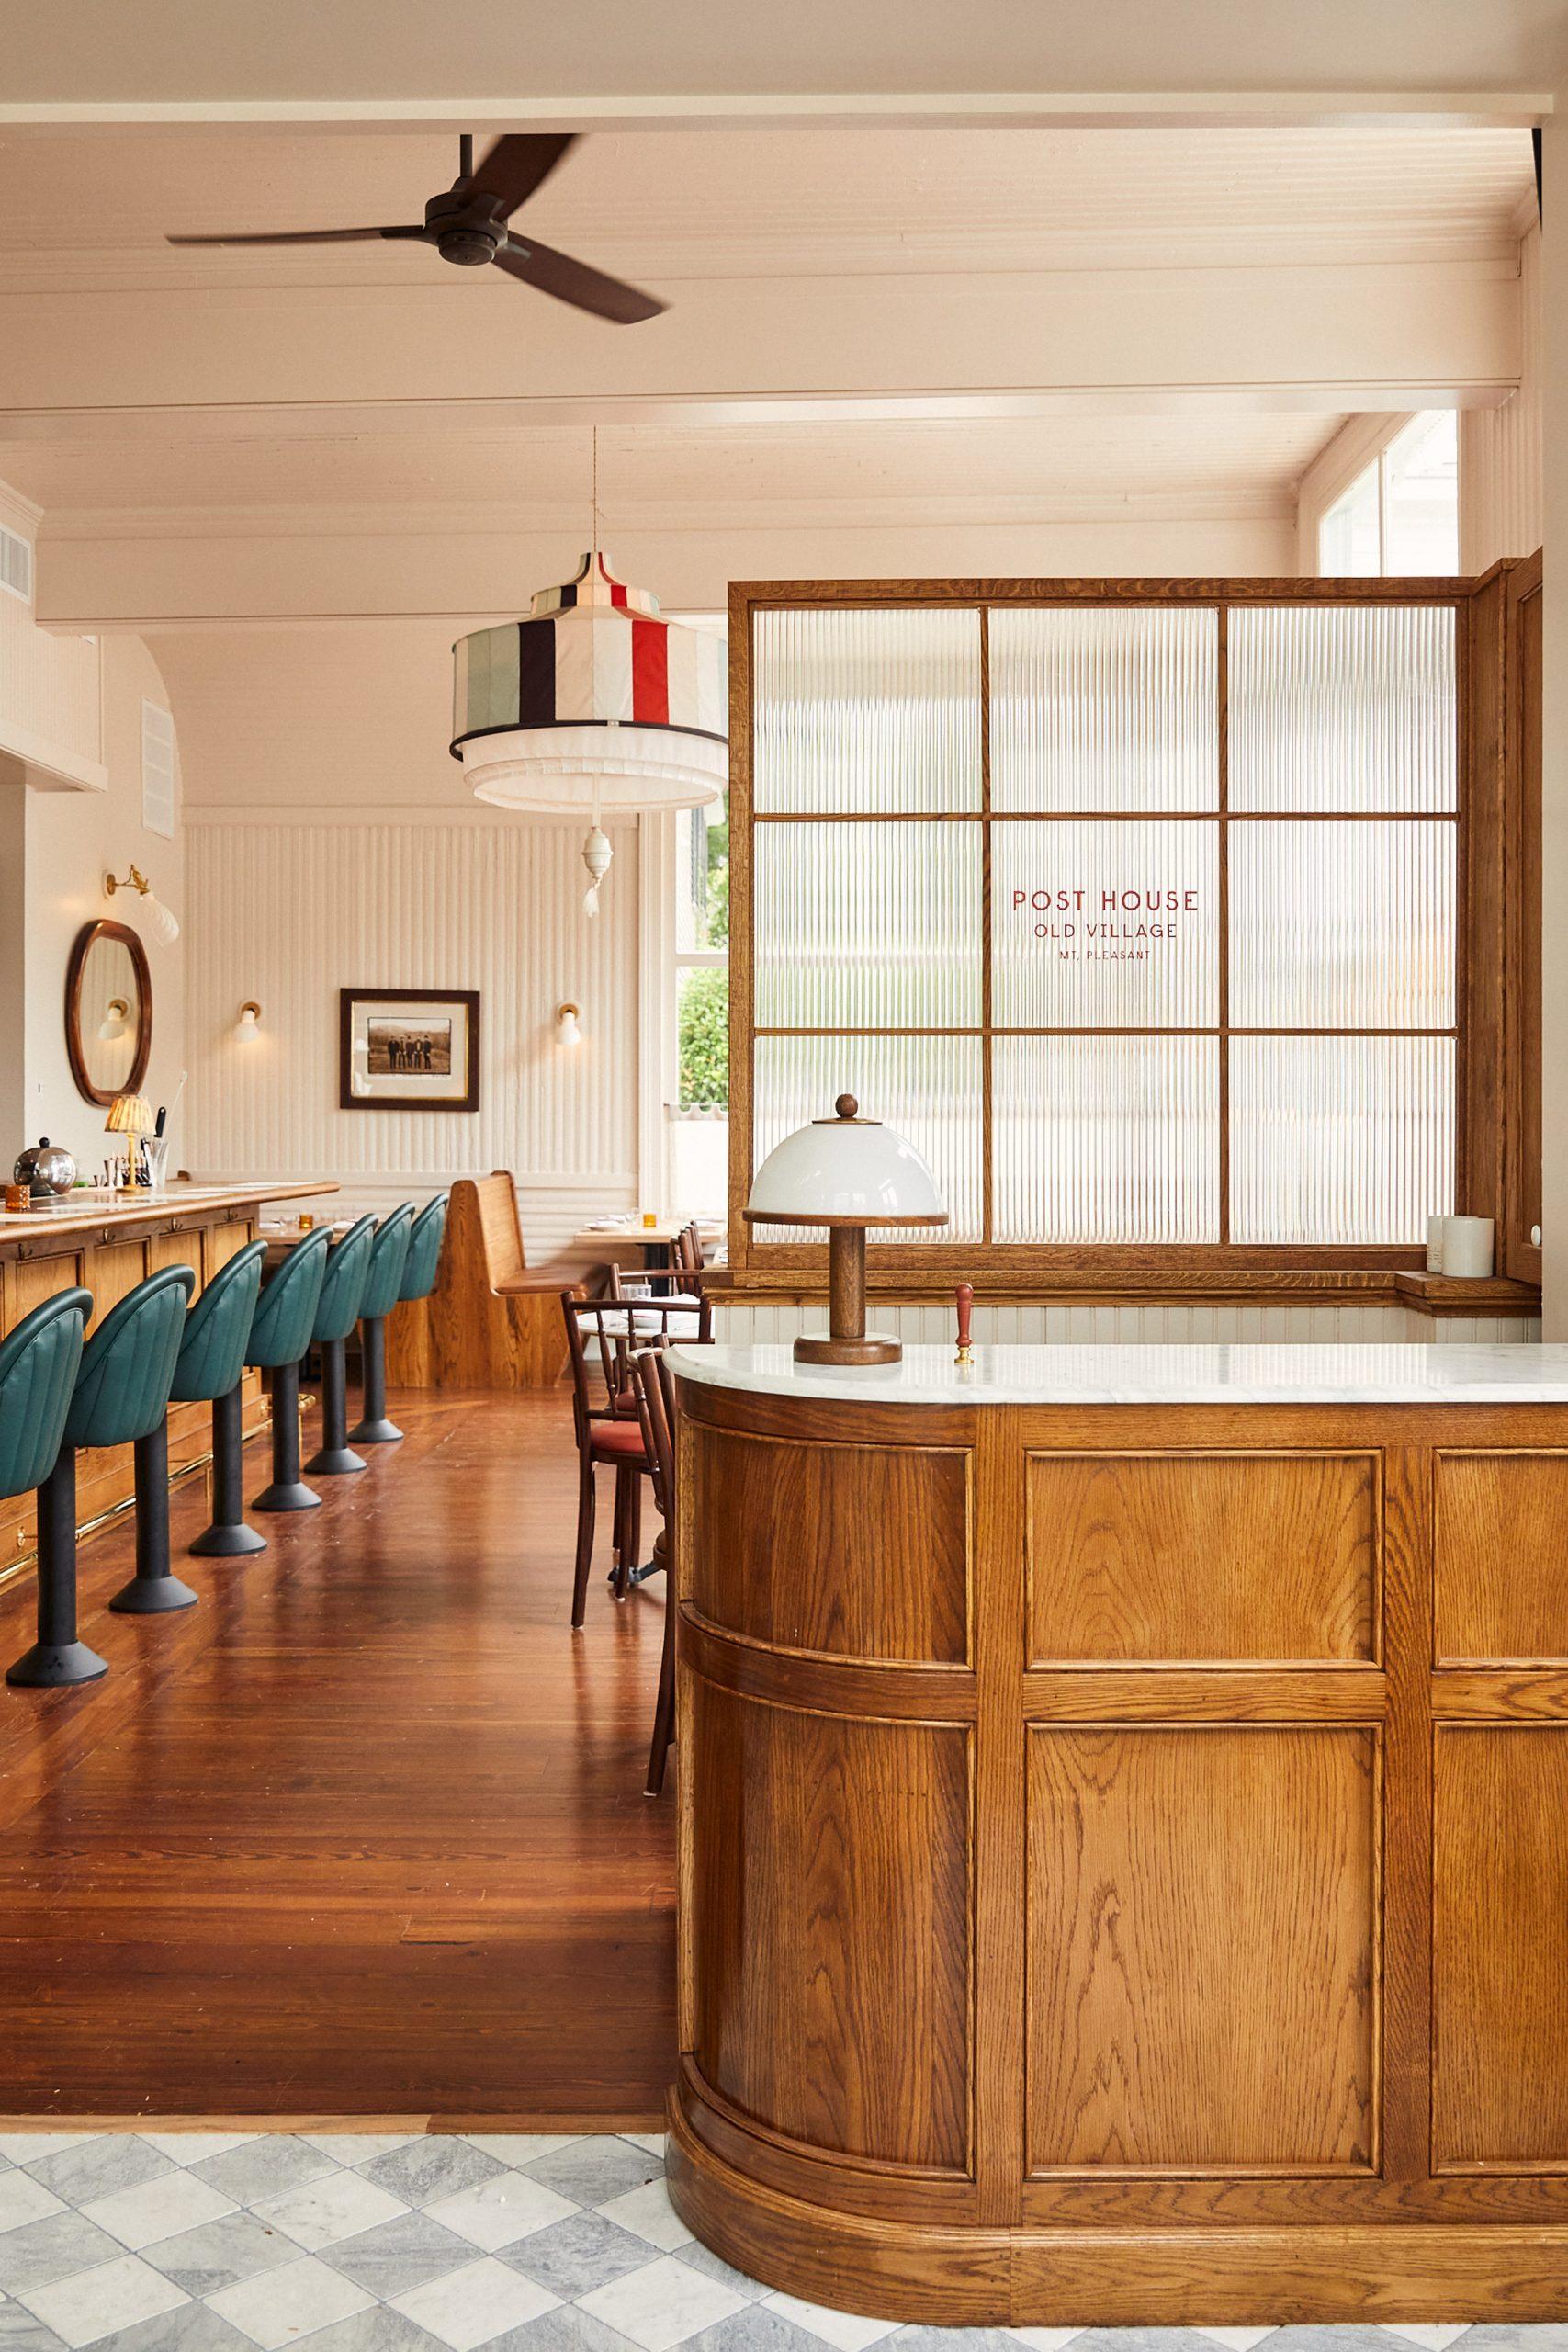 Bar inside Post House inn in Charleston, South Carolina